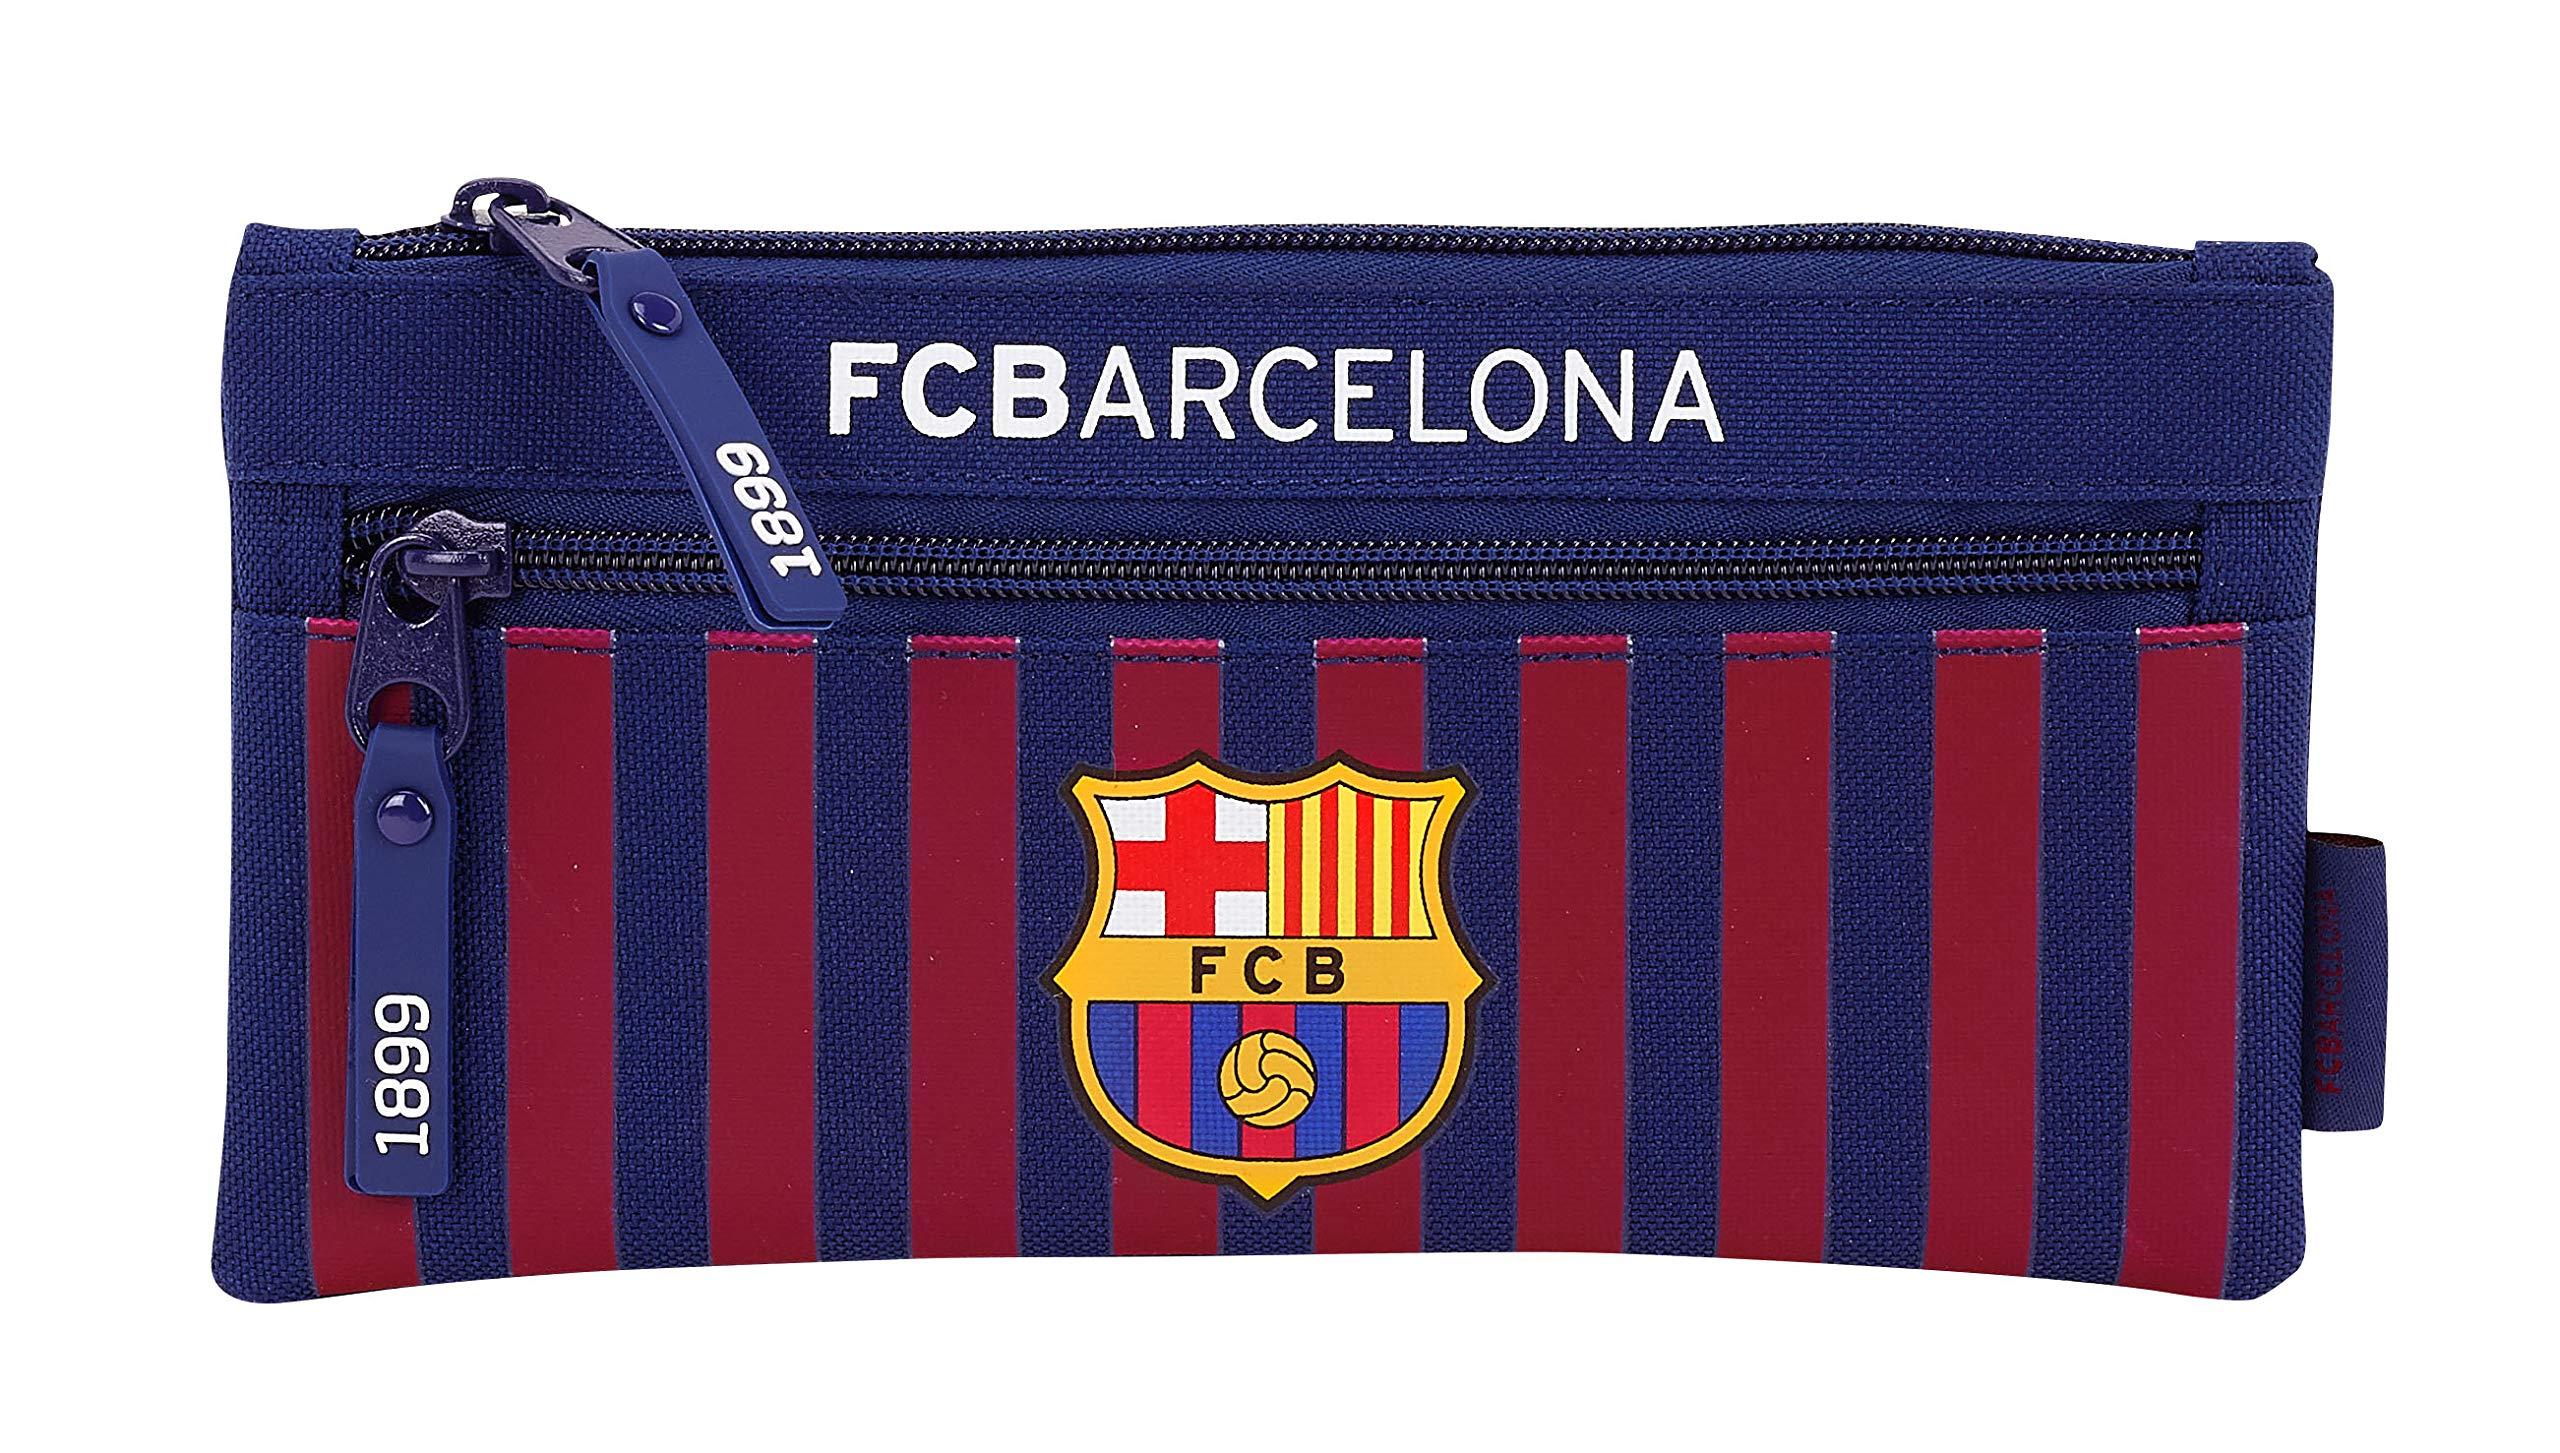 FC Barcelona 811829029 2018 Estuches 22 cm, Azul